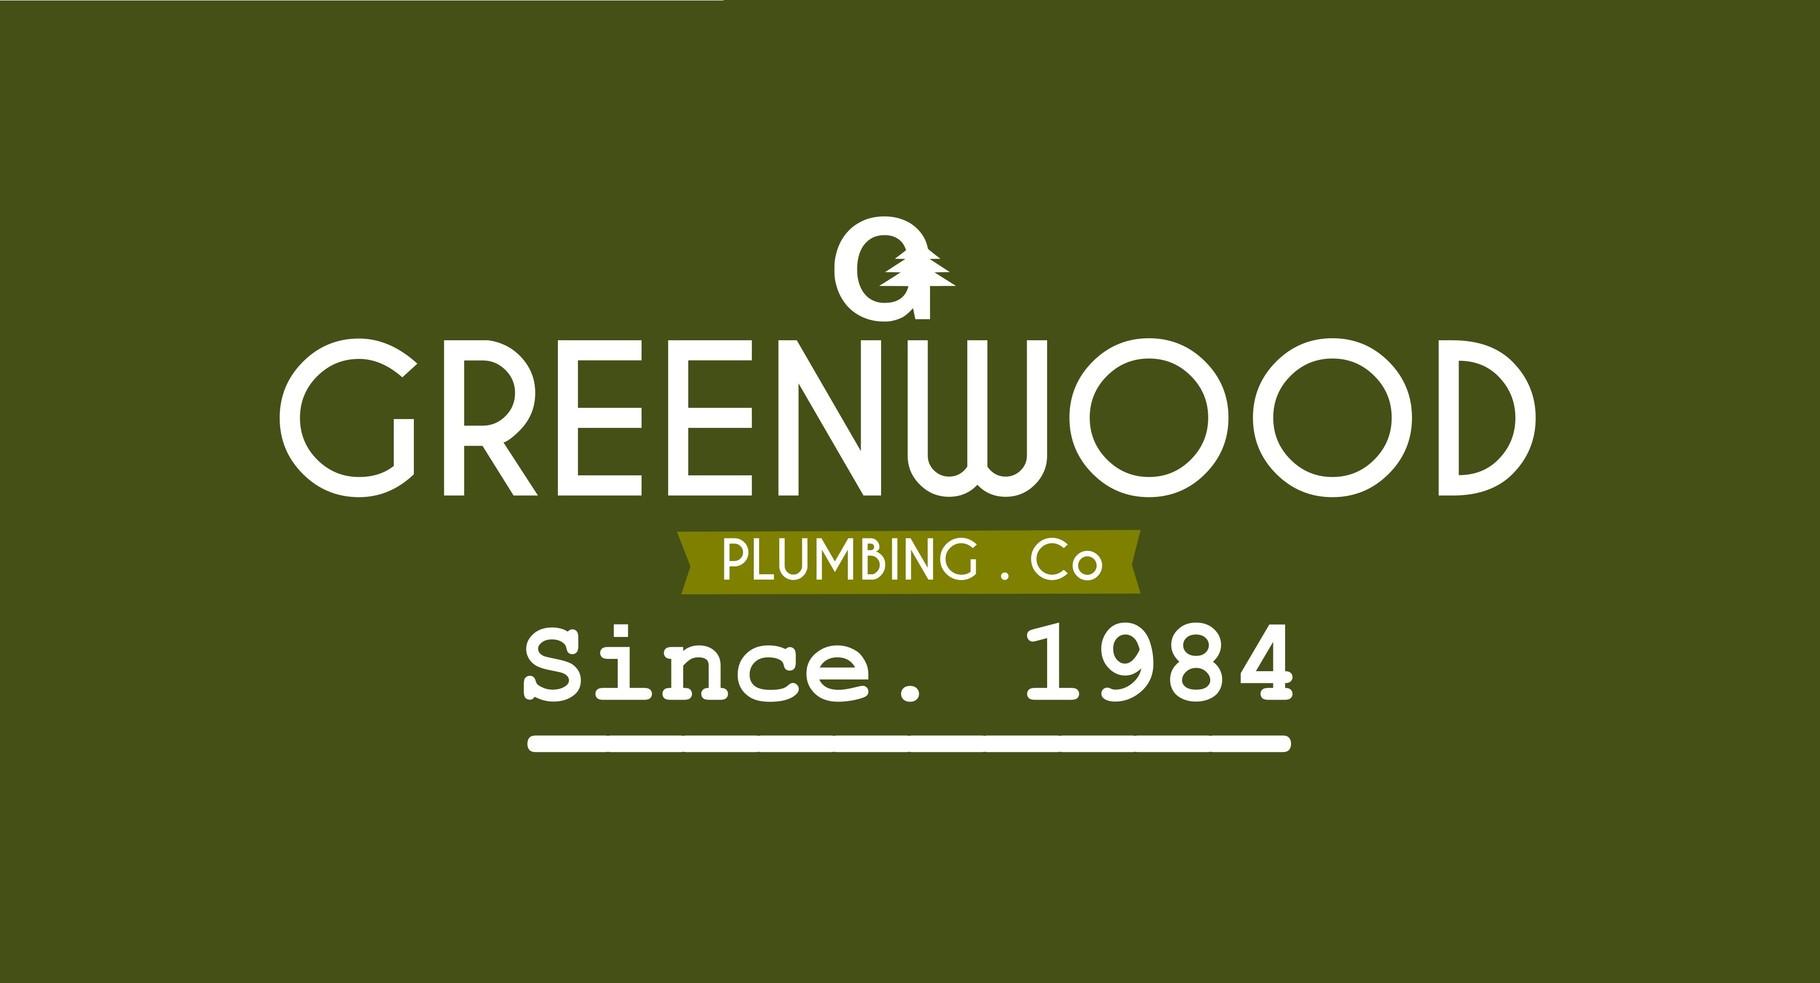 Greenwood Plumbing Services2086